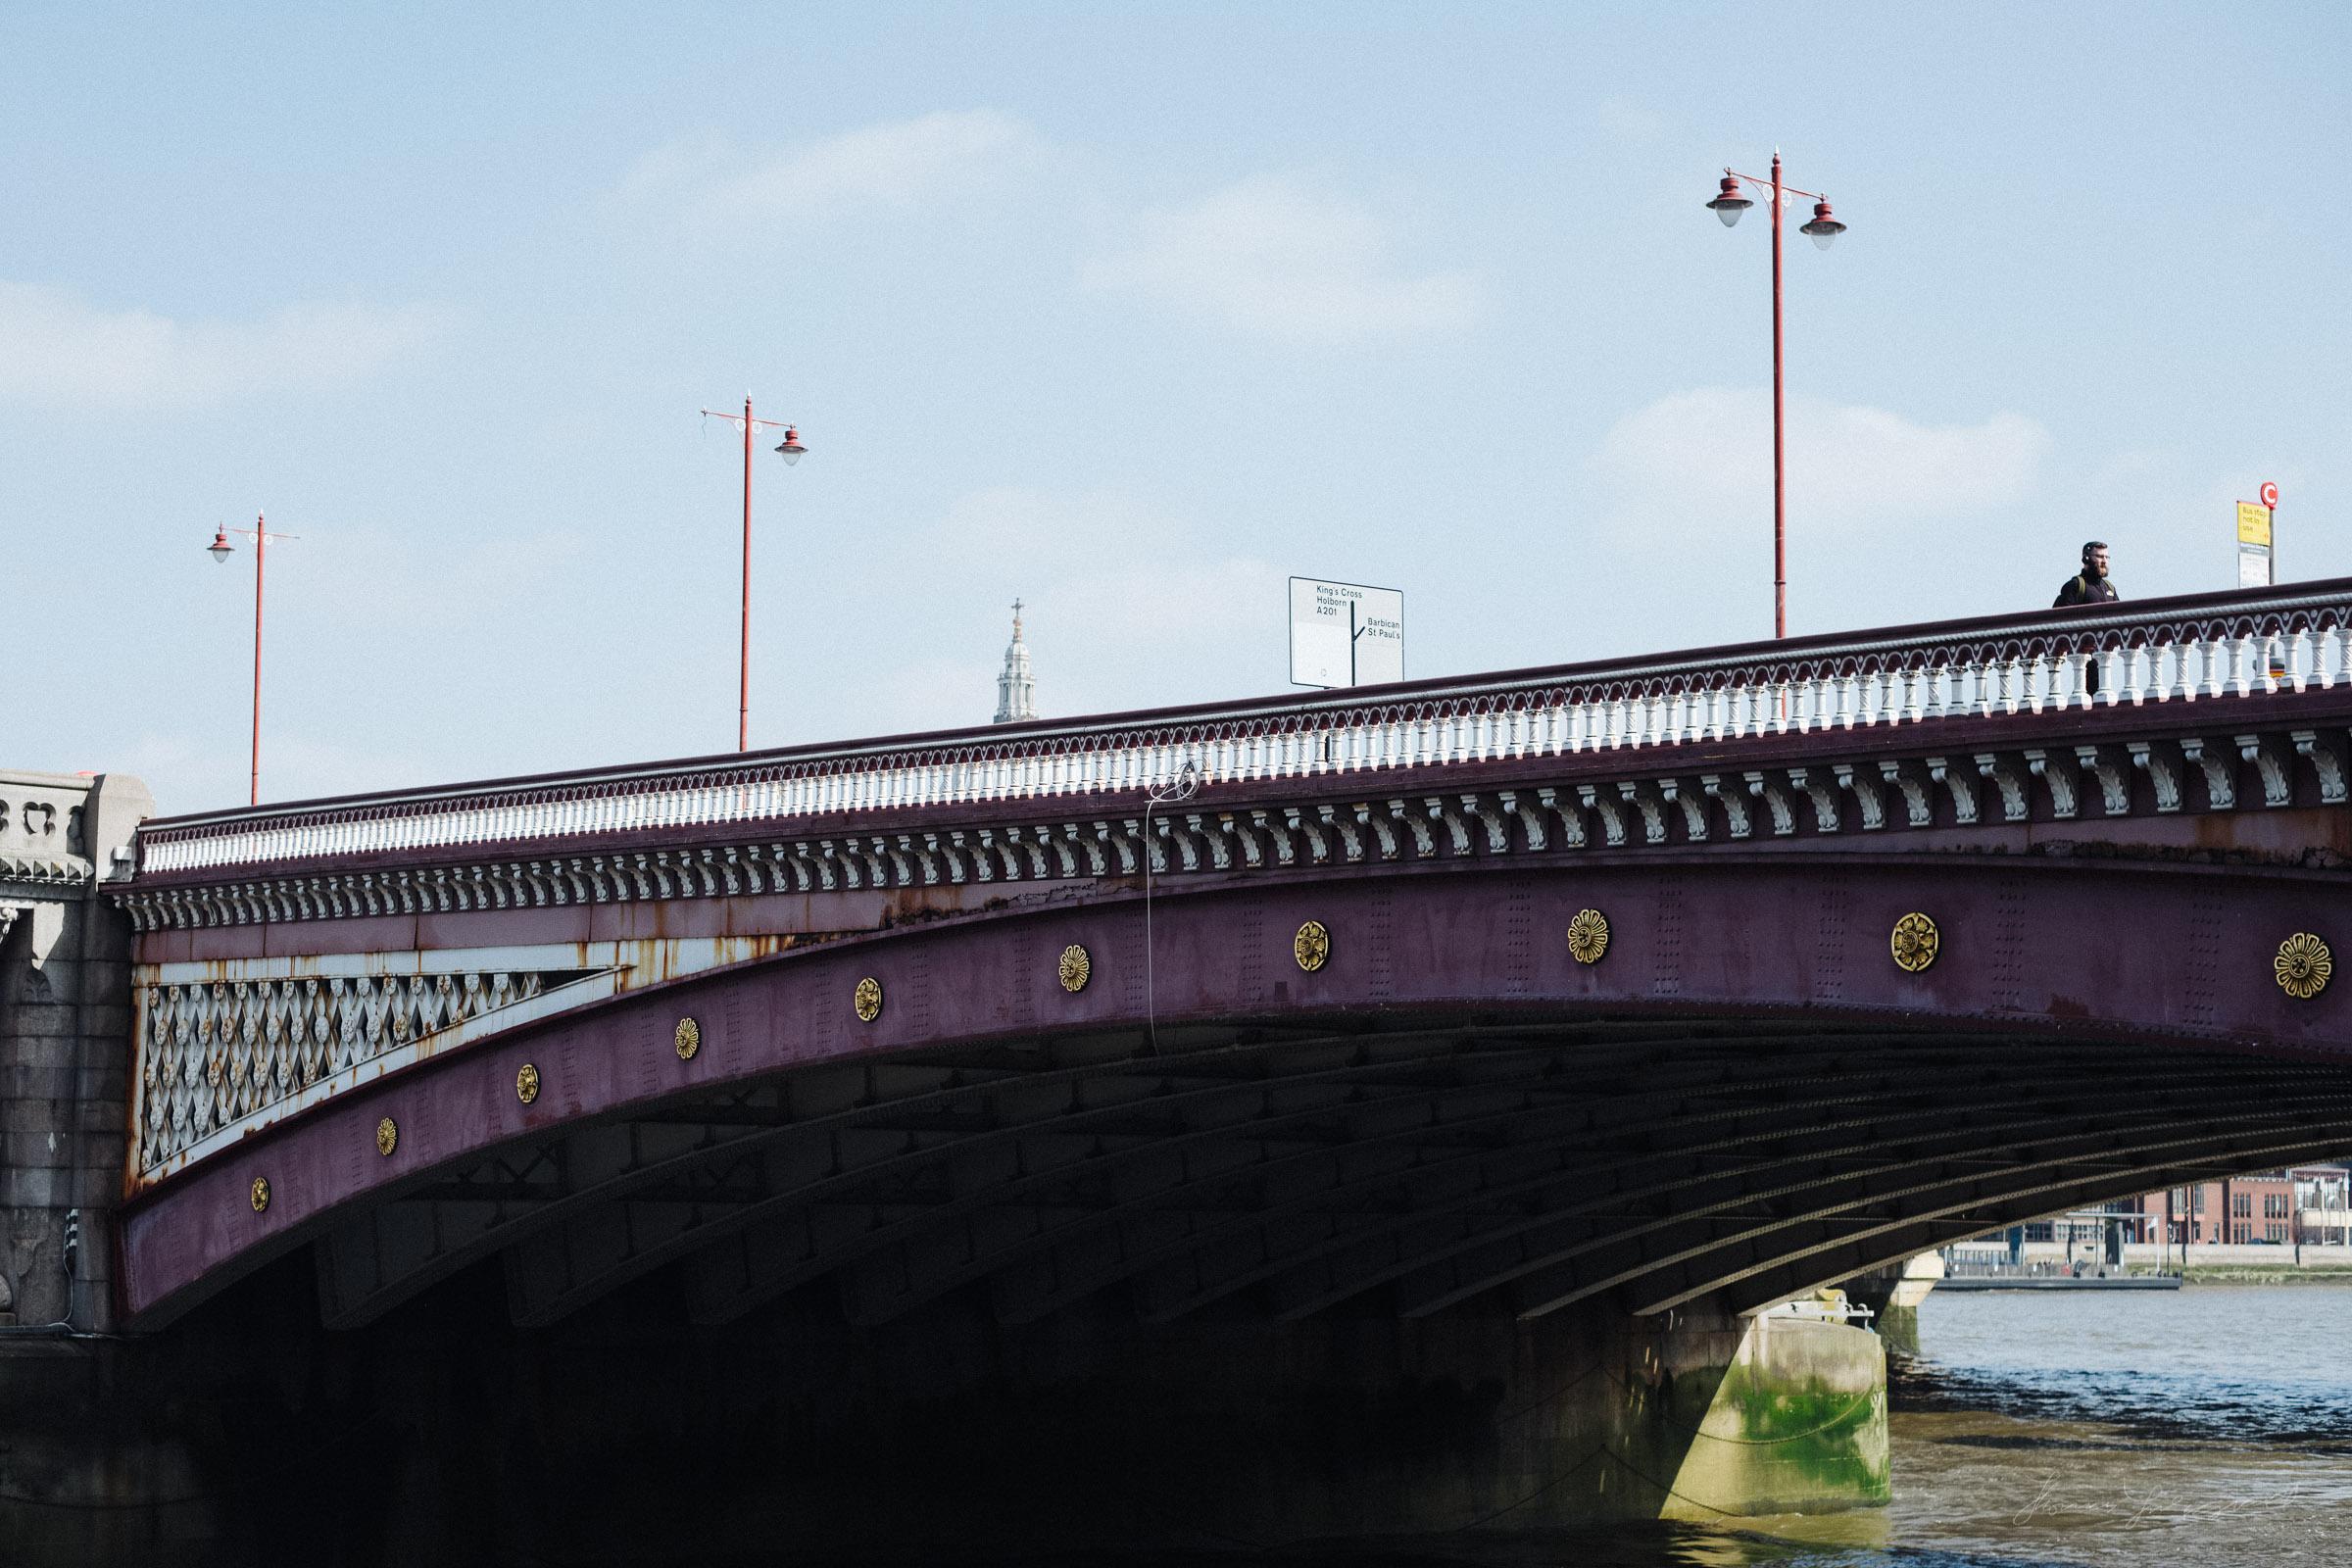 A single pedestrian crossing a London Bridge